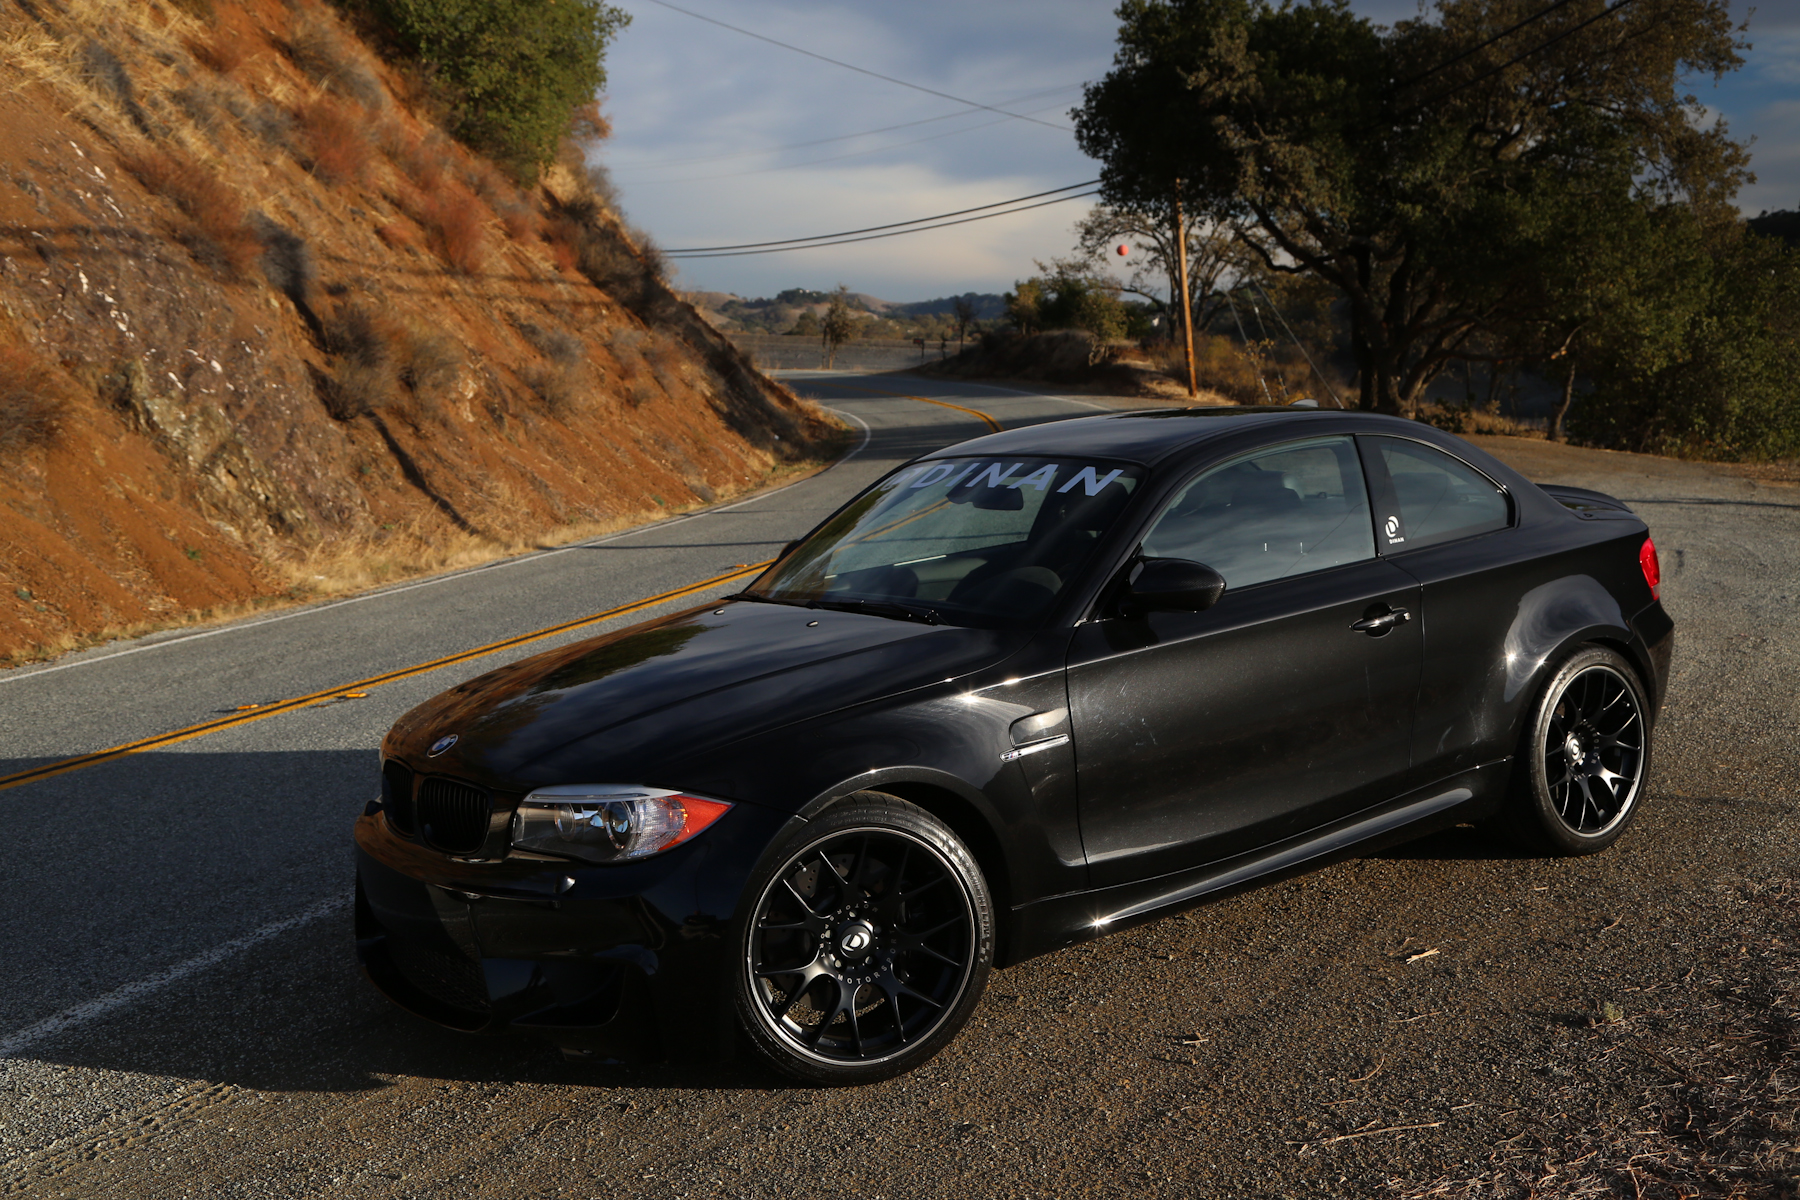 Dinan 1M S3 R BMW 1M Shawn Molnar BMWBLOG 110